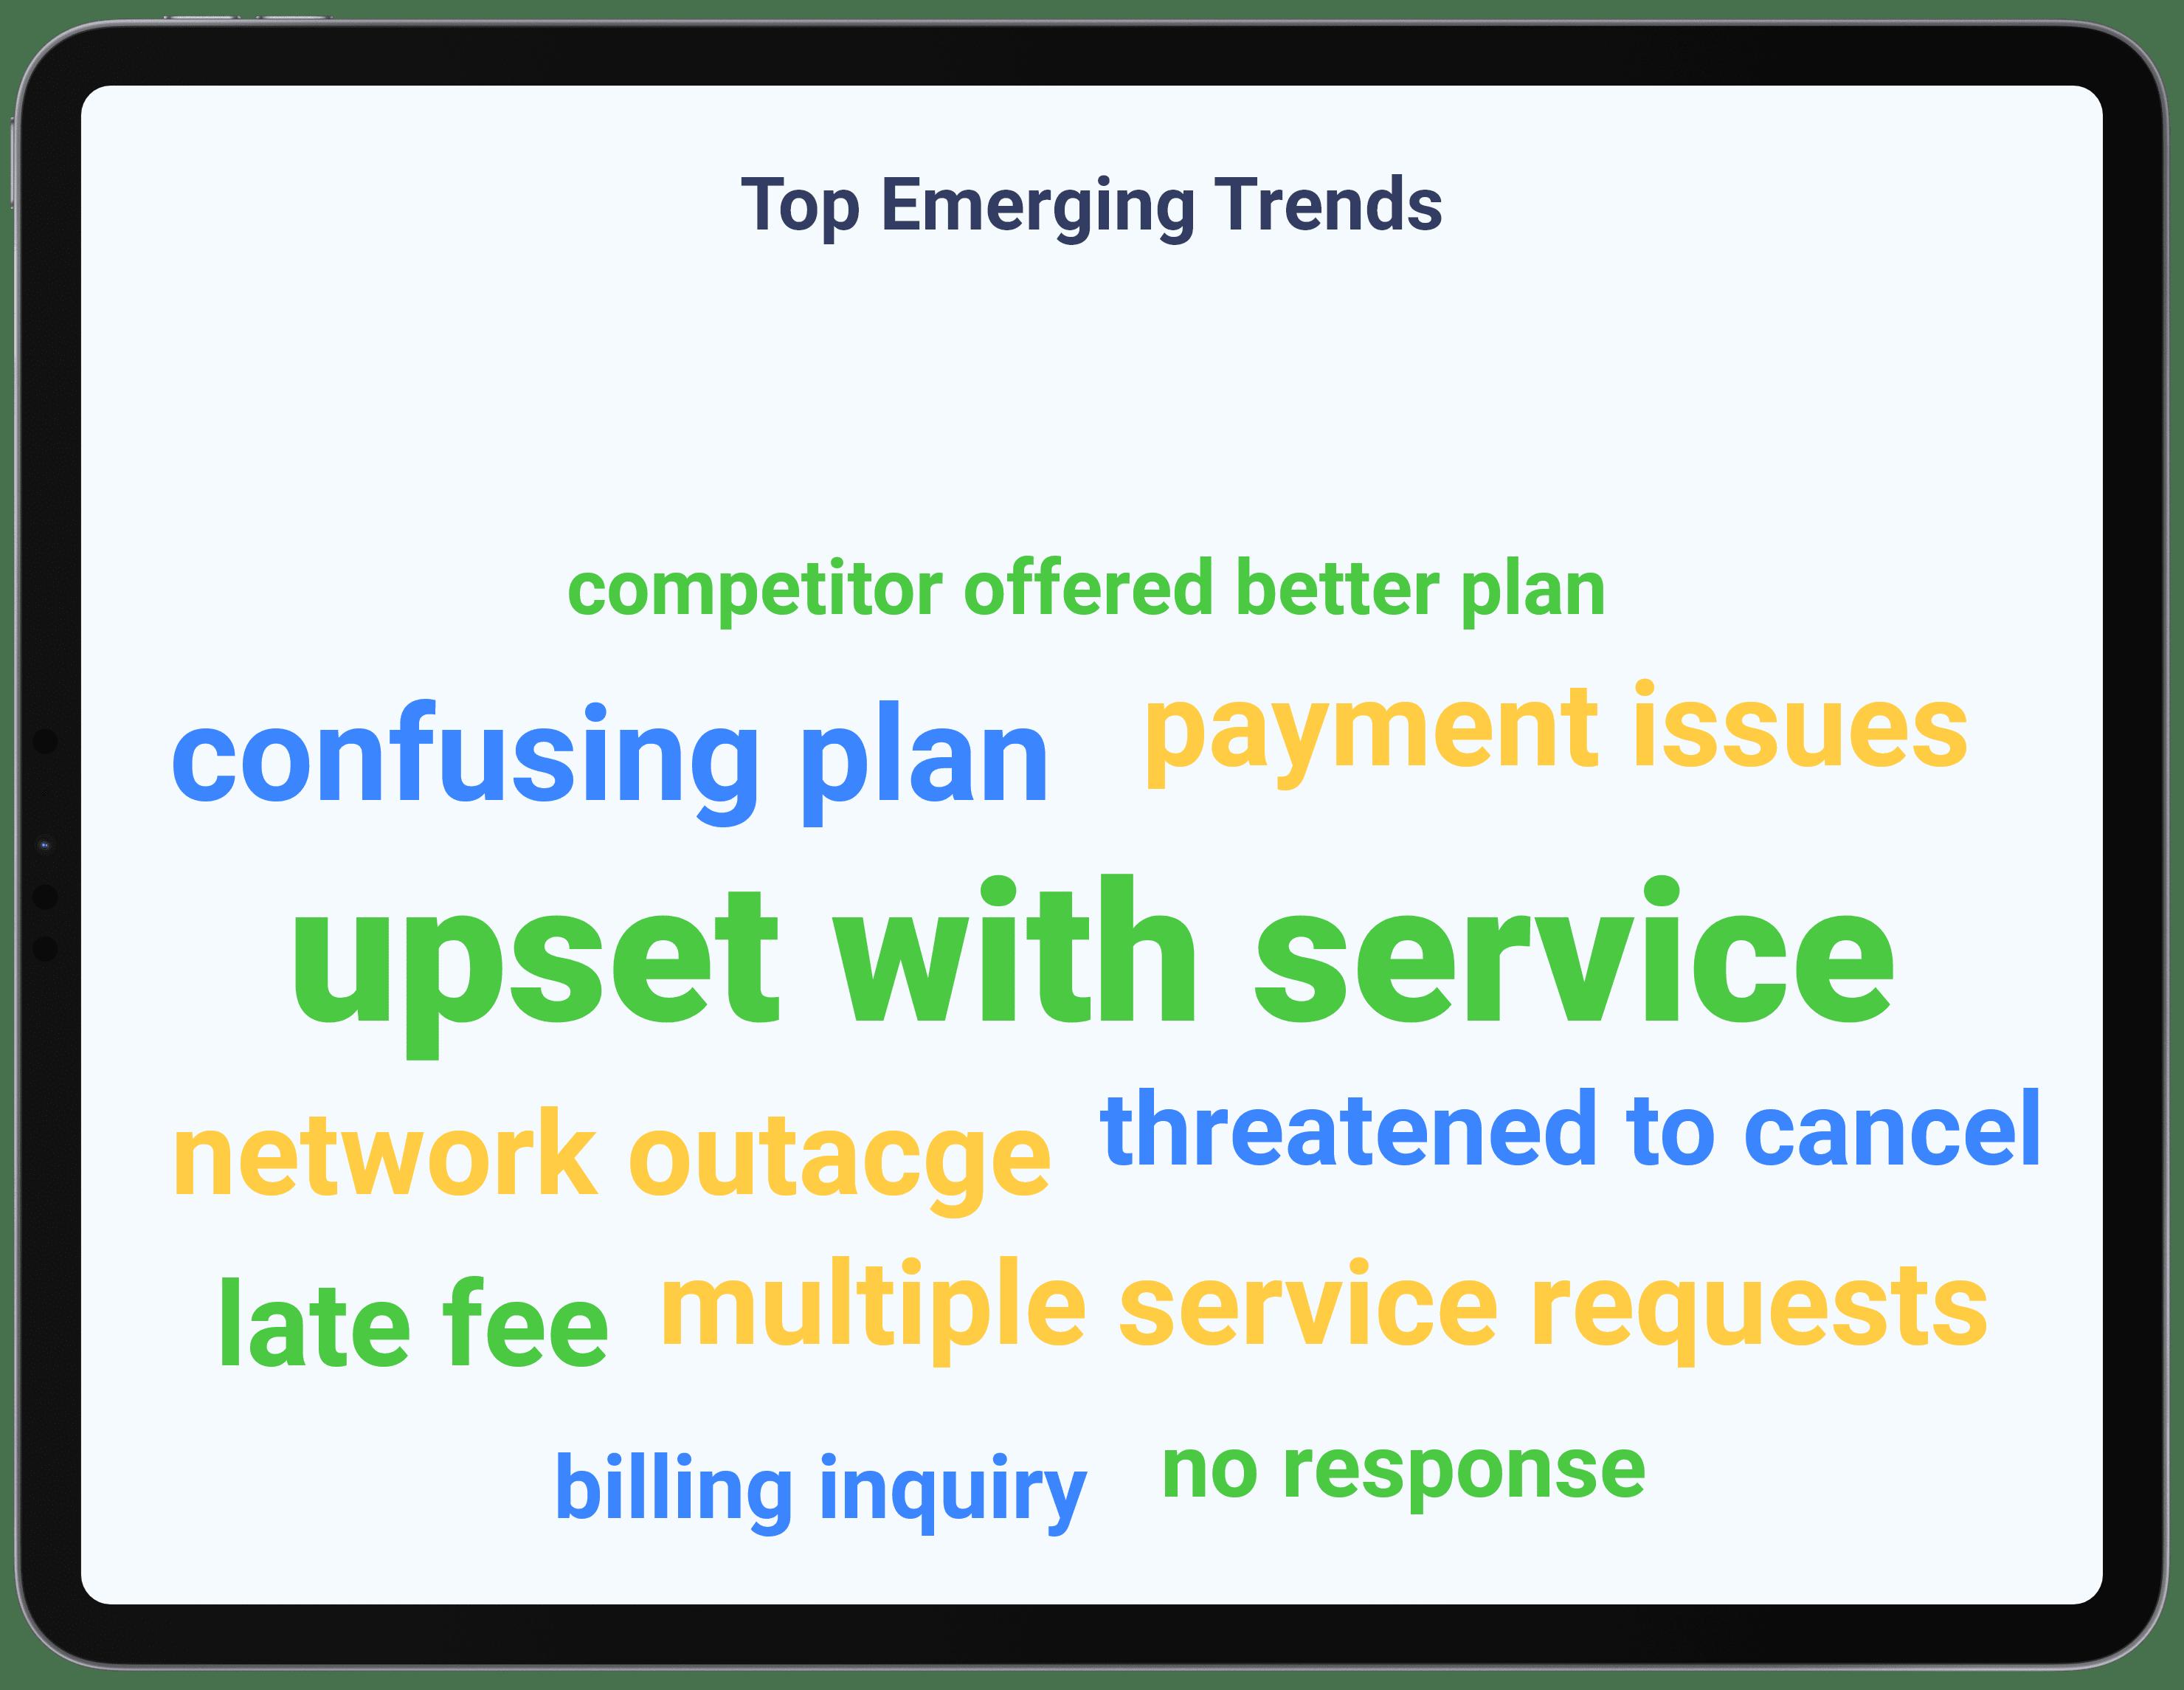 Telecommunications - Identify Trending Topics